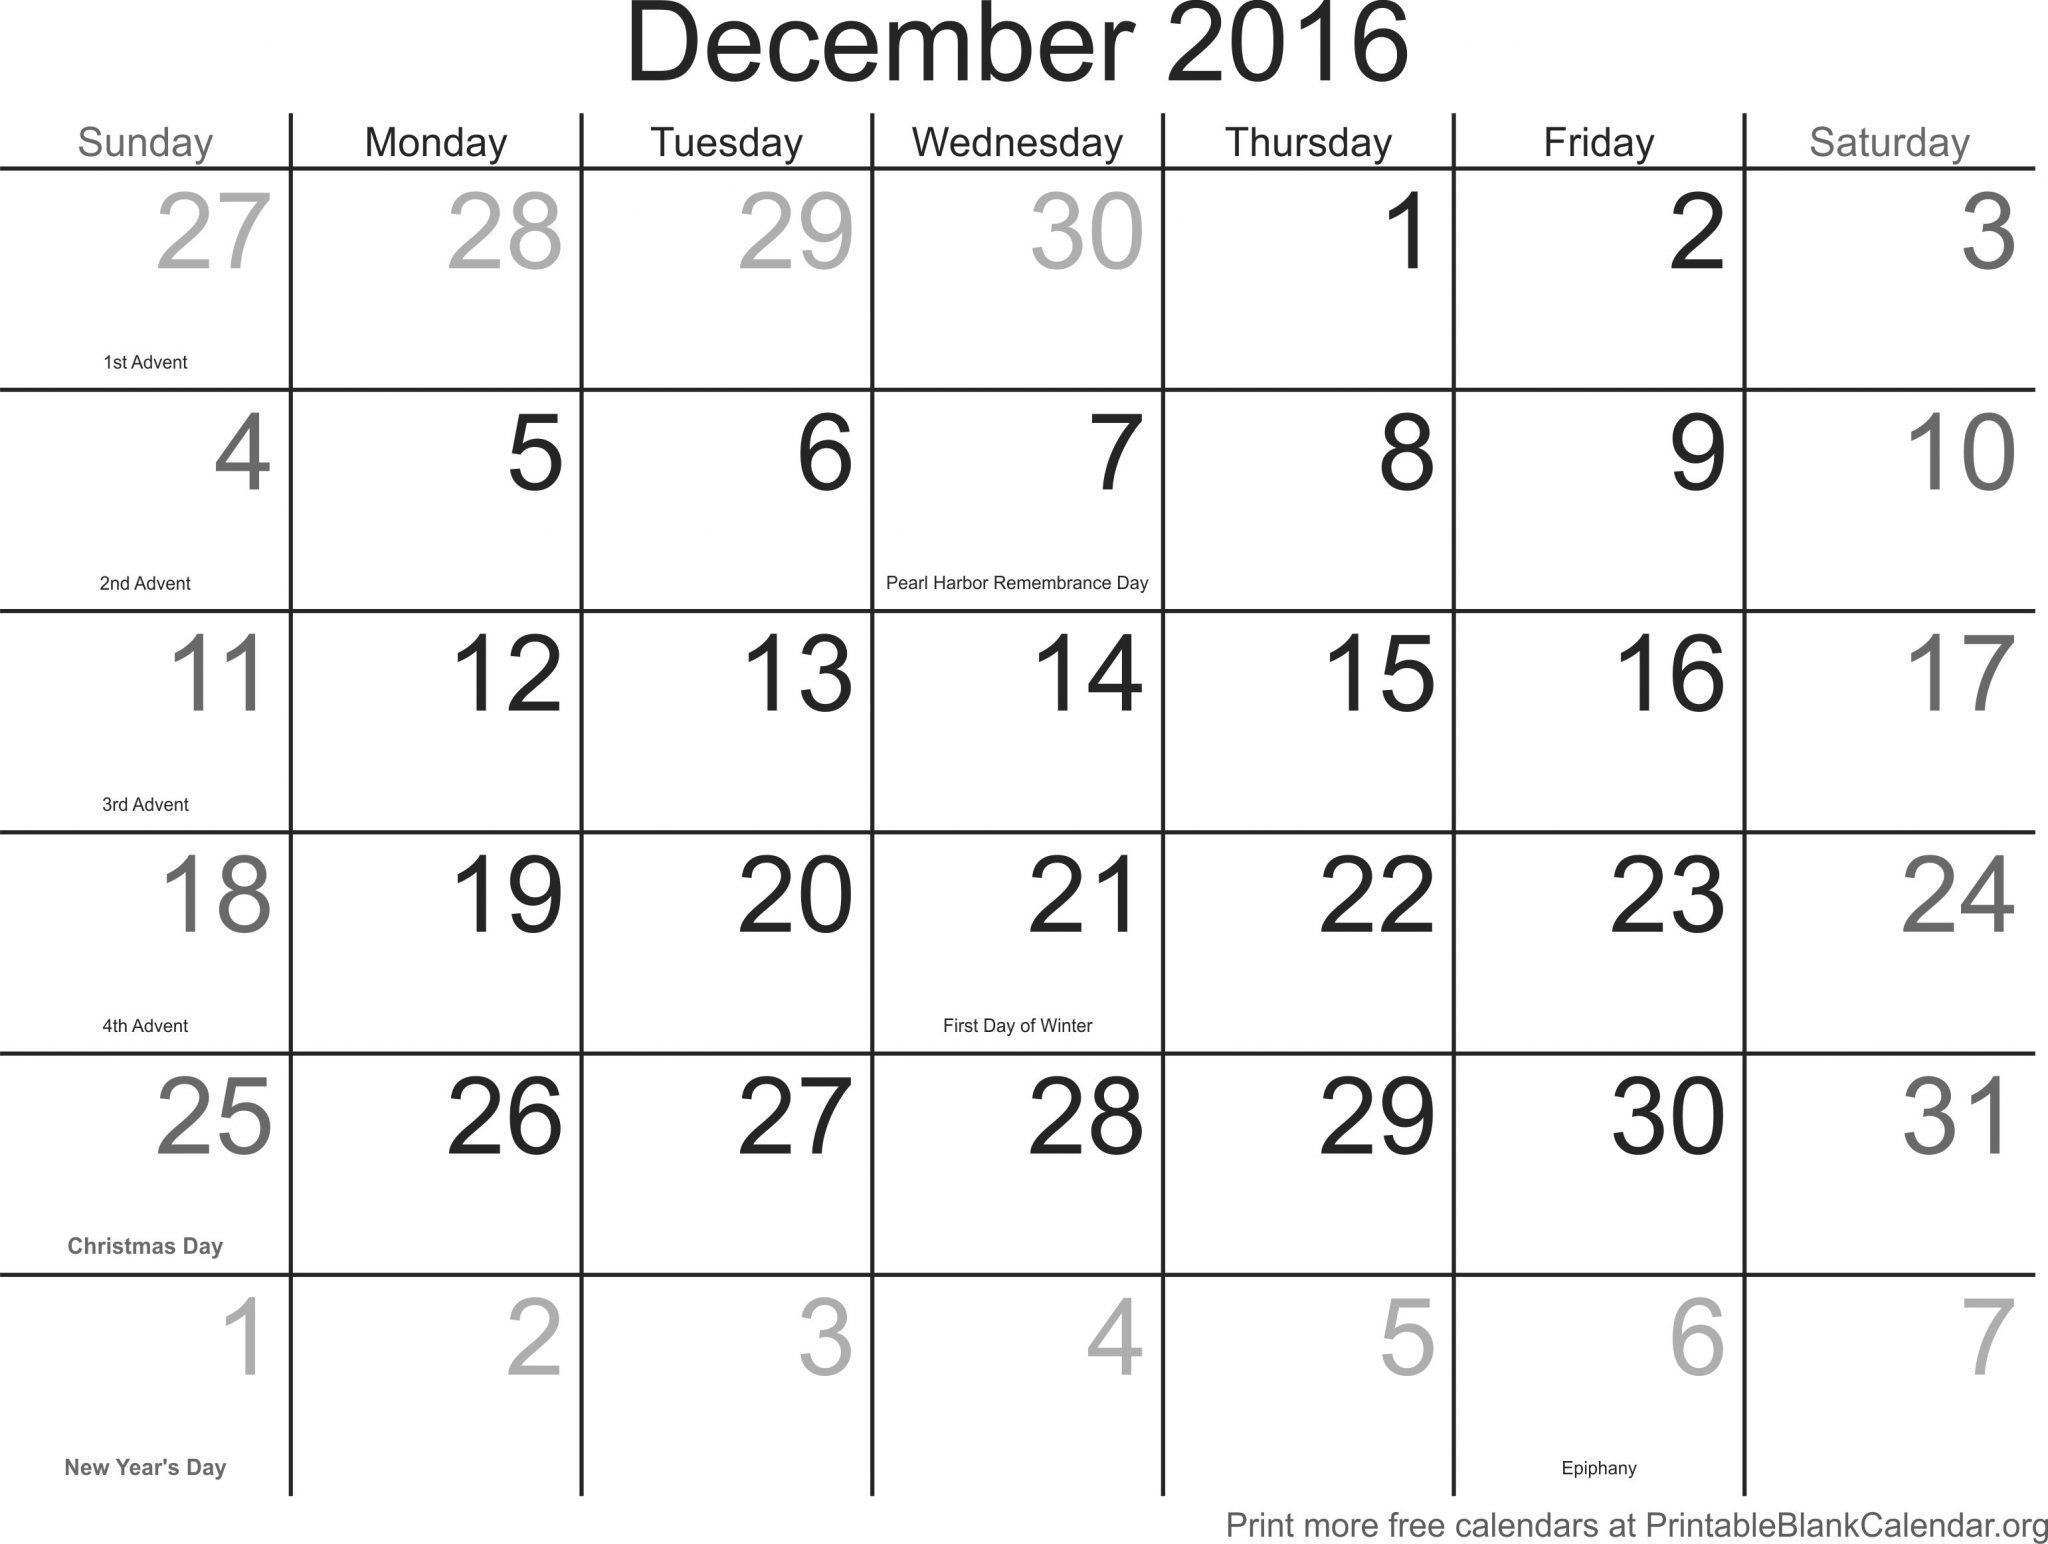 December Calendar 2016 With Holidays : Blank december calendar templates printable word pdf